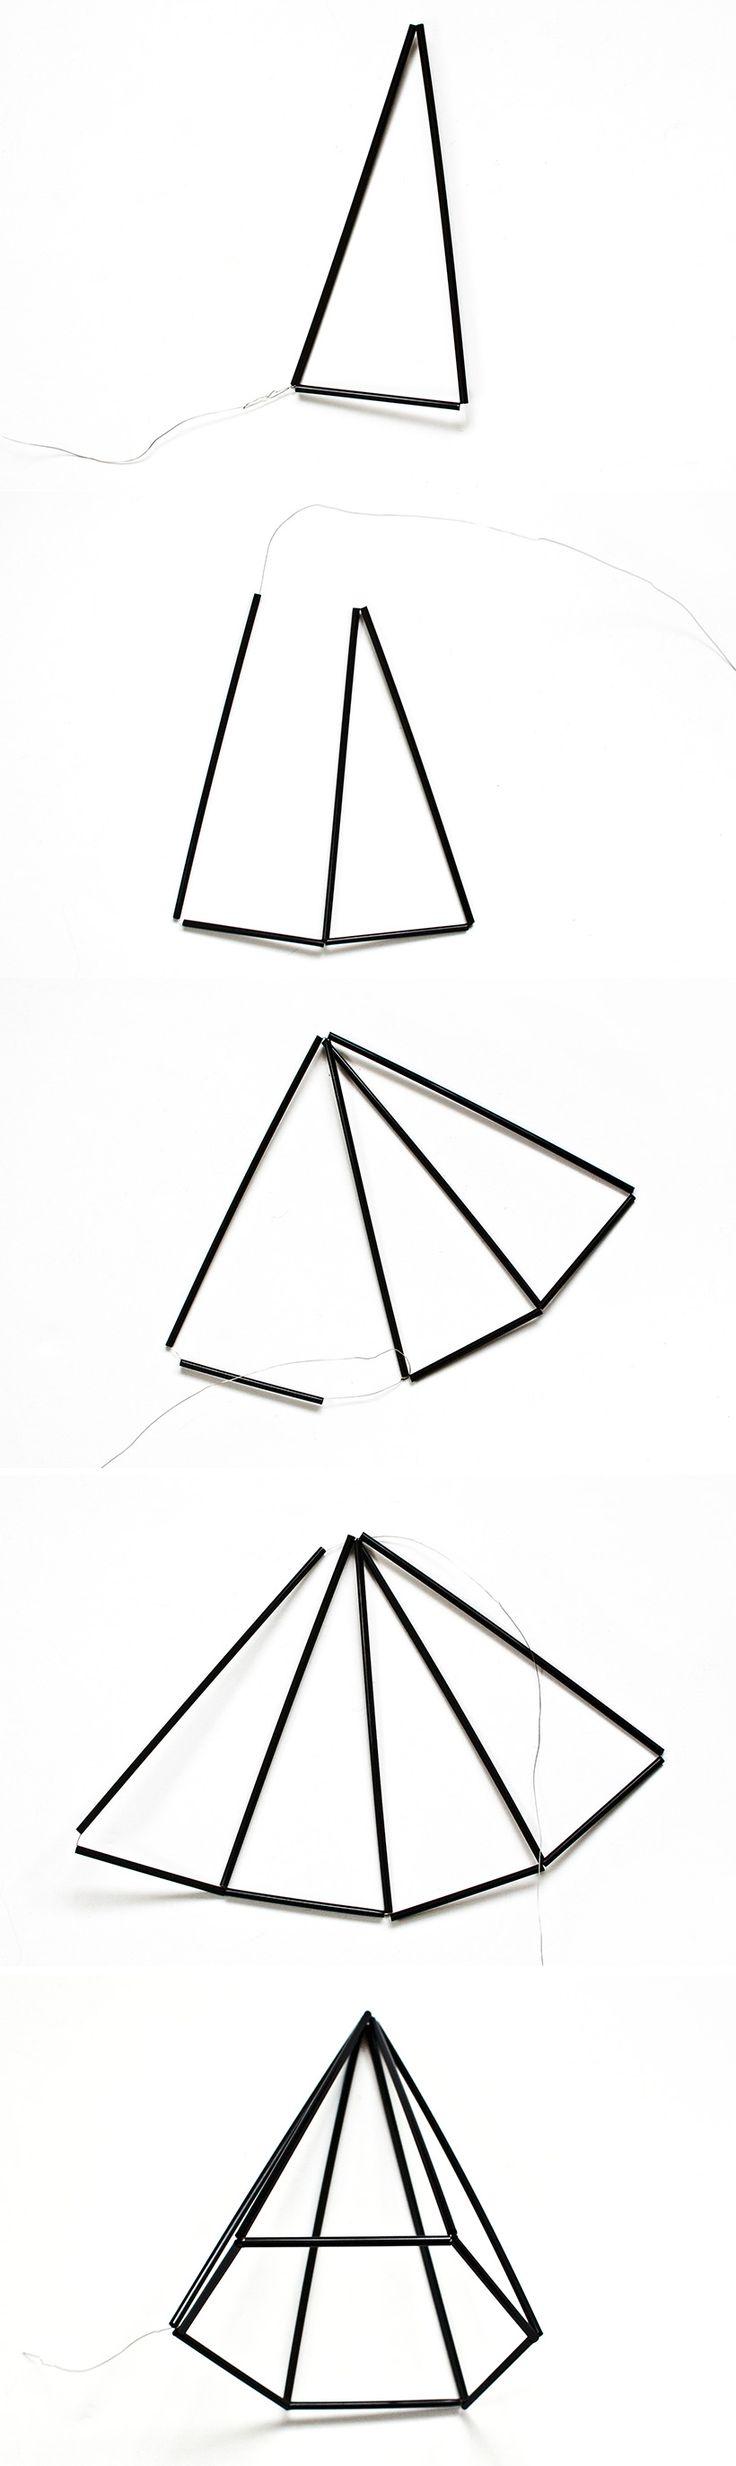 DIY Himmeli Geometric Gem Decor | Transient Expression